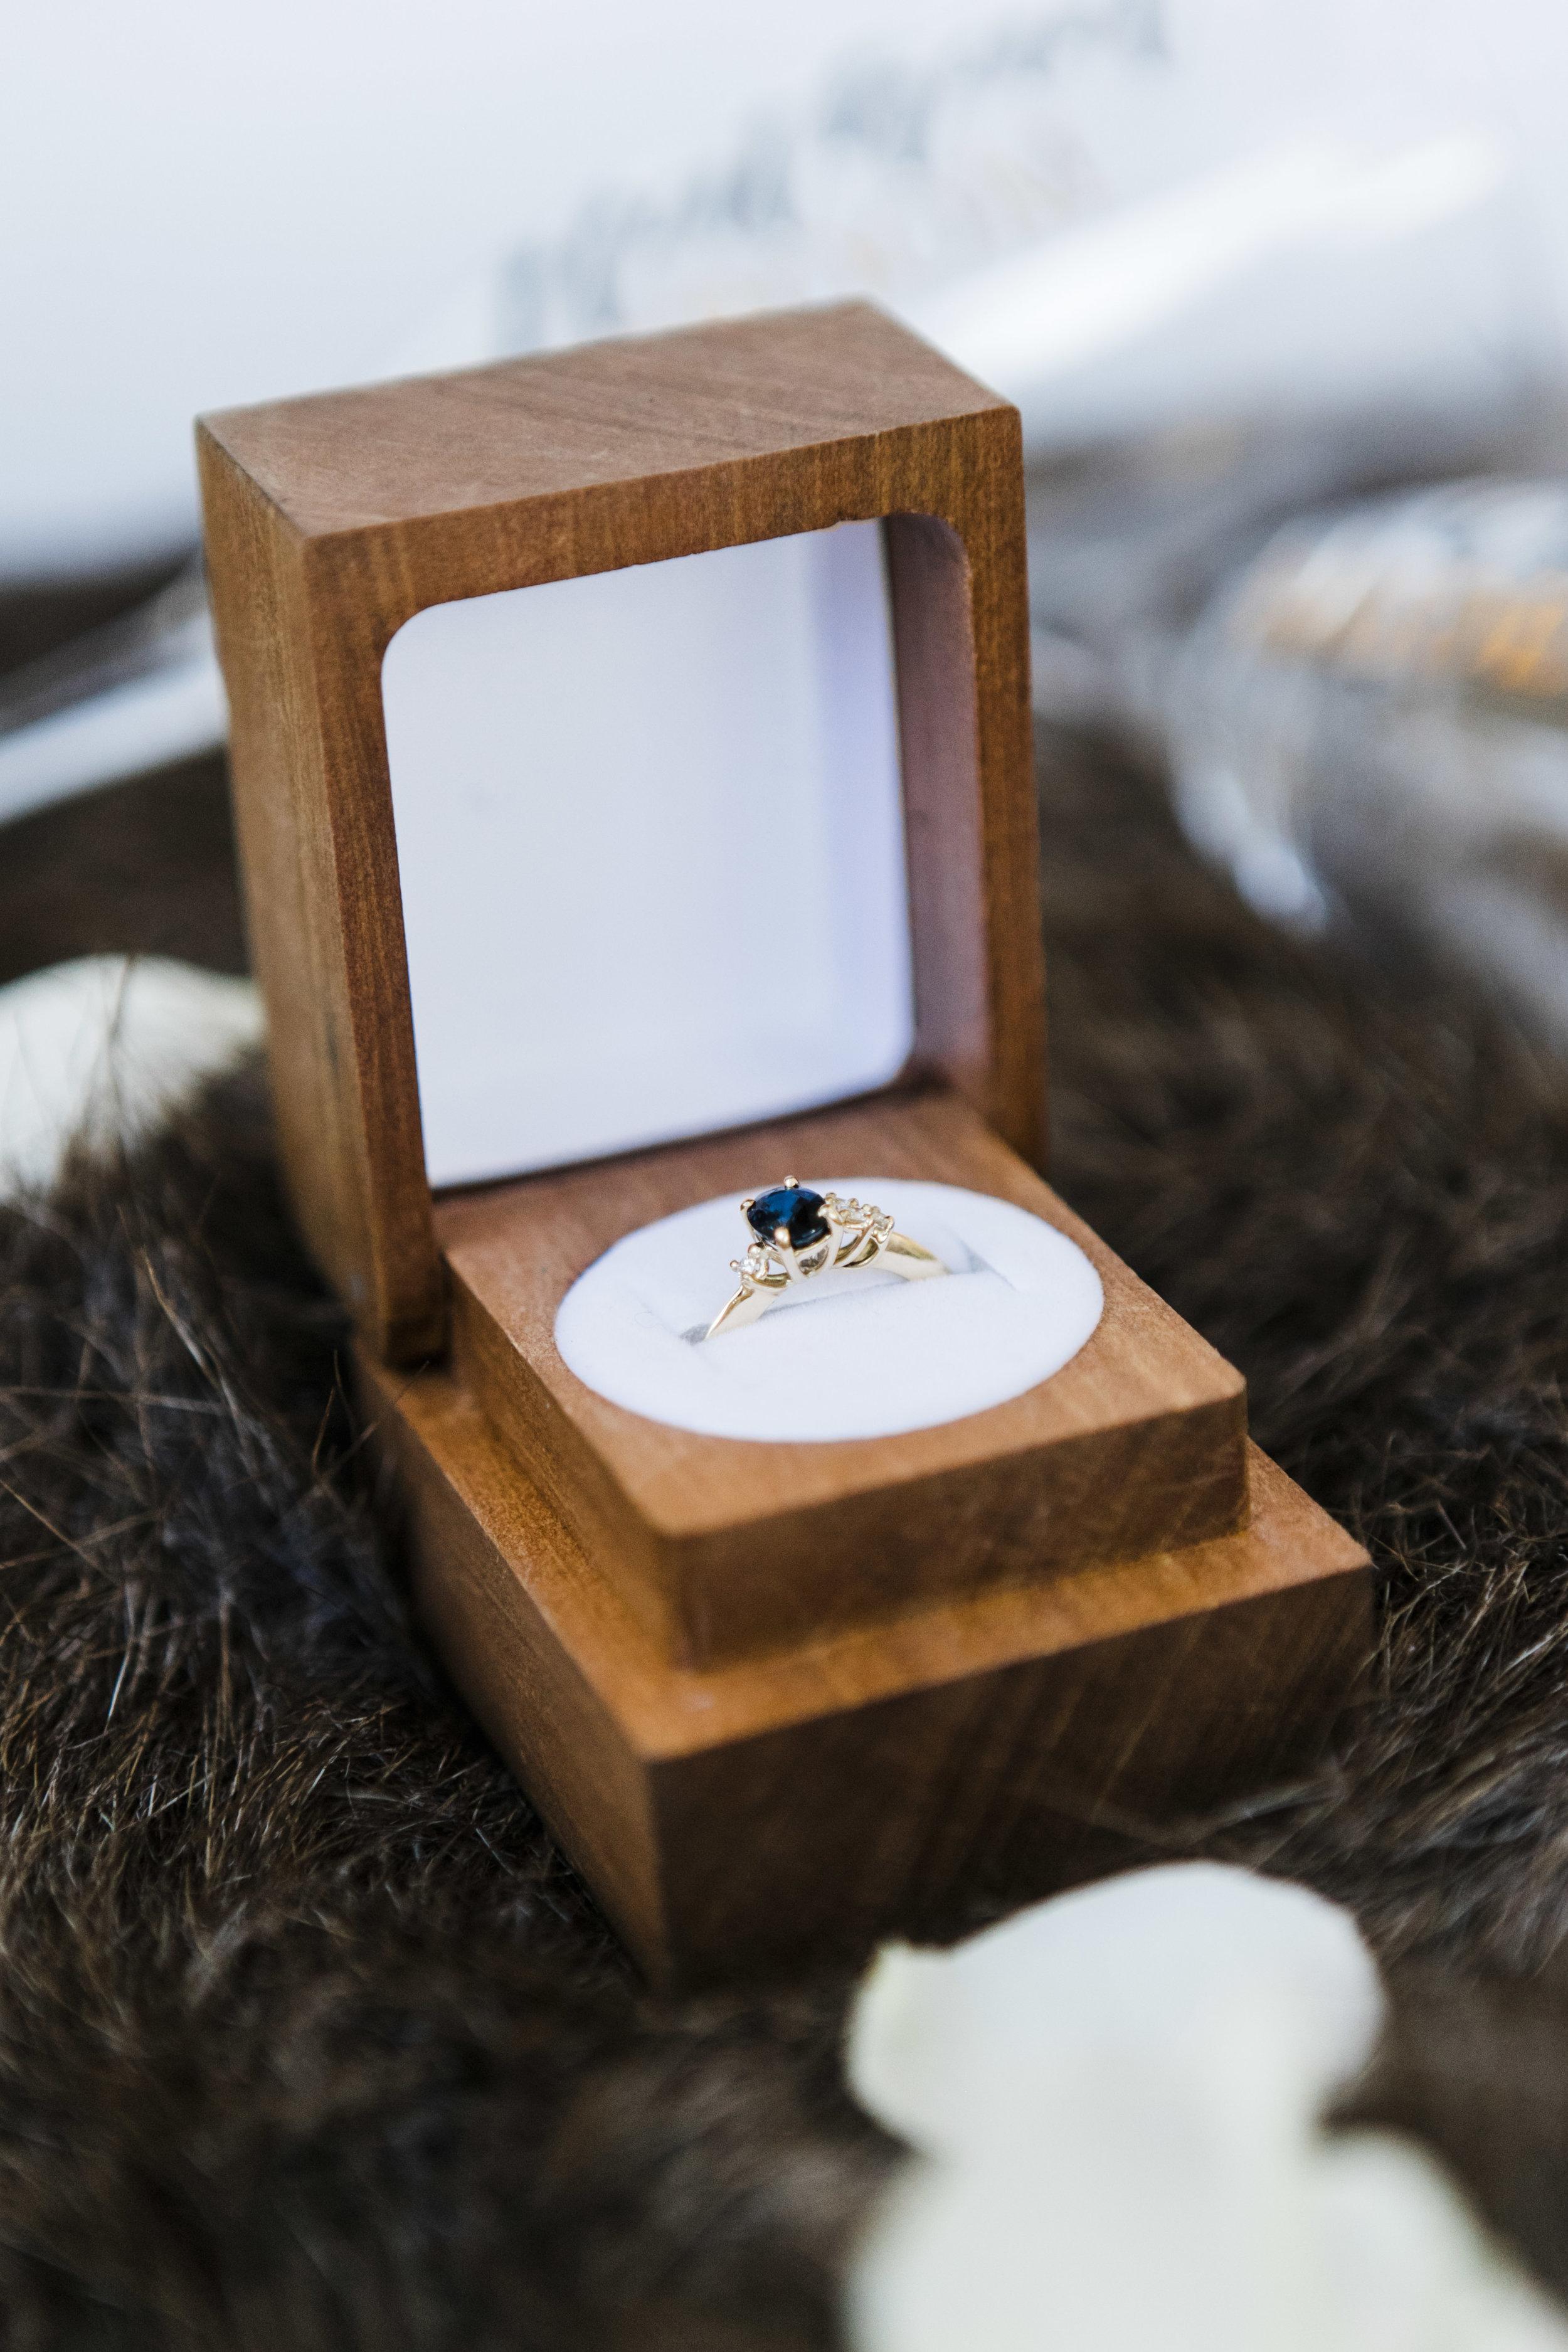 Stunning Australian Black Sapphire and diamond ring by Katie Rose Jewellery.